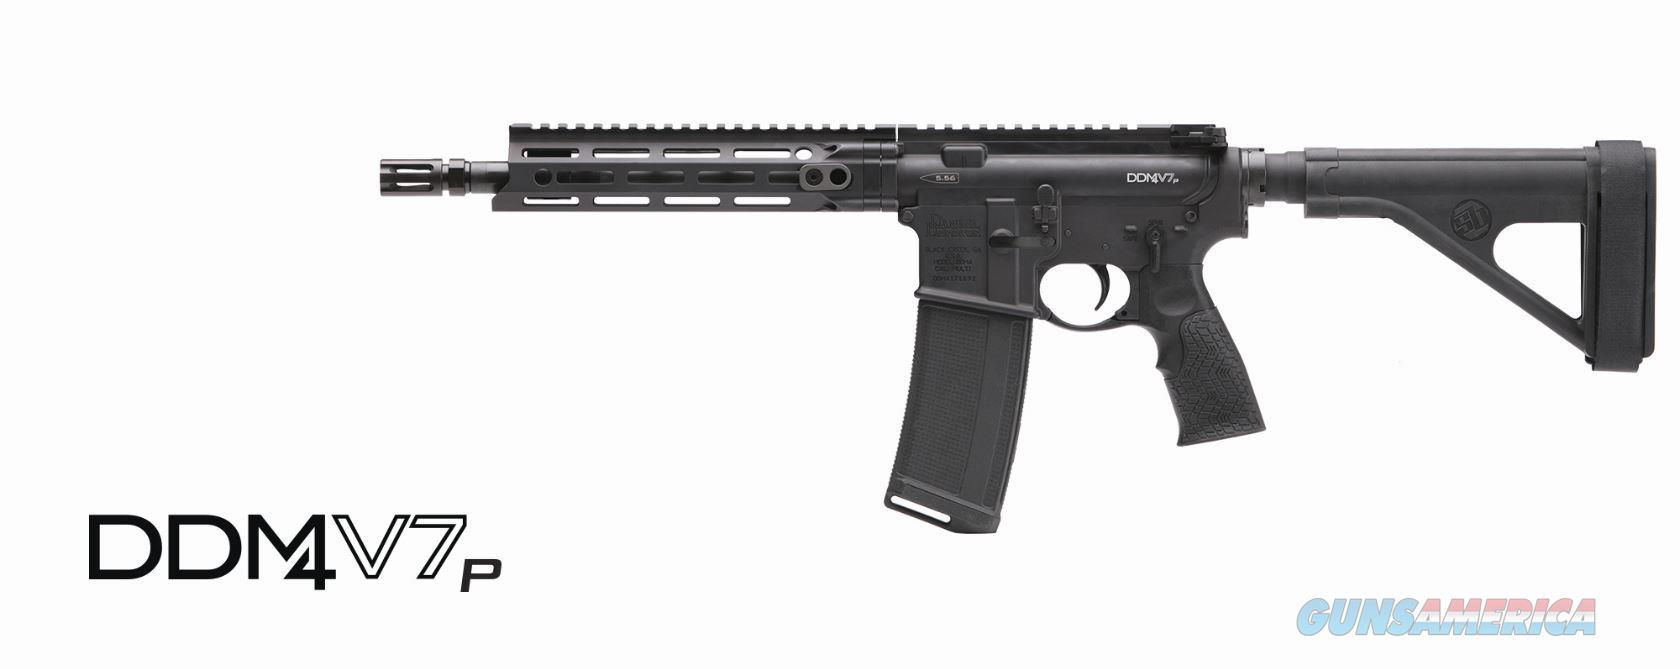 Daniel Defense Ddm4 V7 Carbine Pstl 02-128-17050  Guns > Pistols > D Misc Pistols